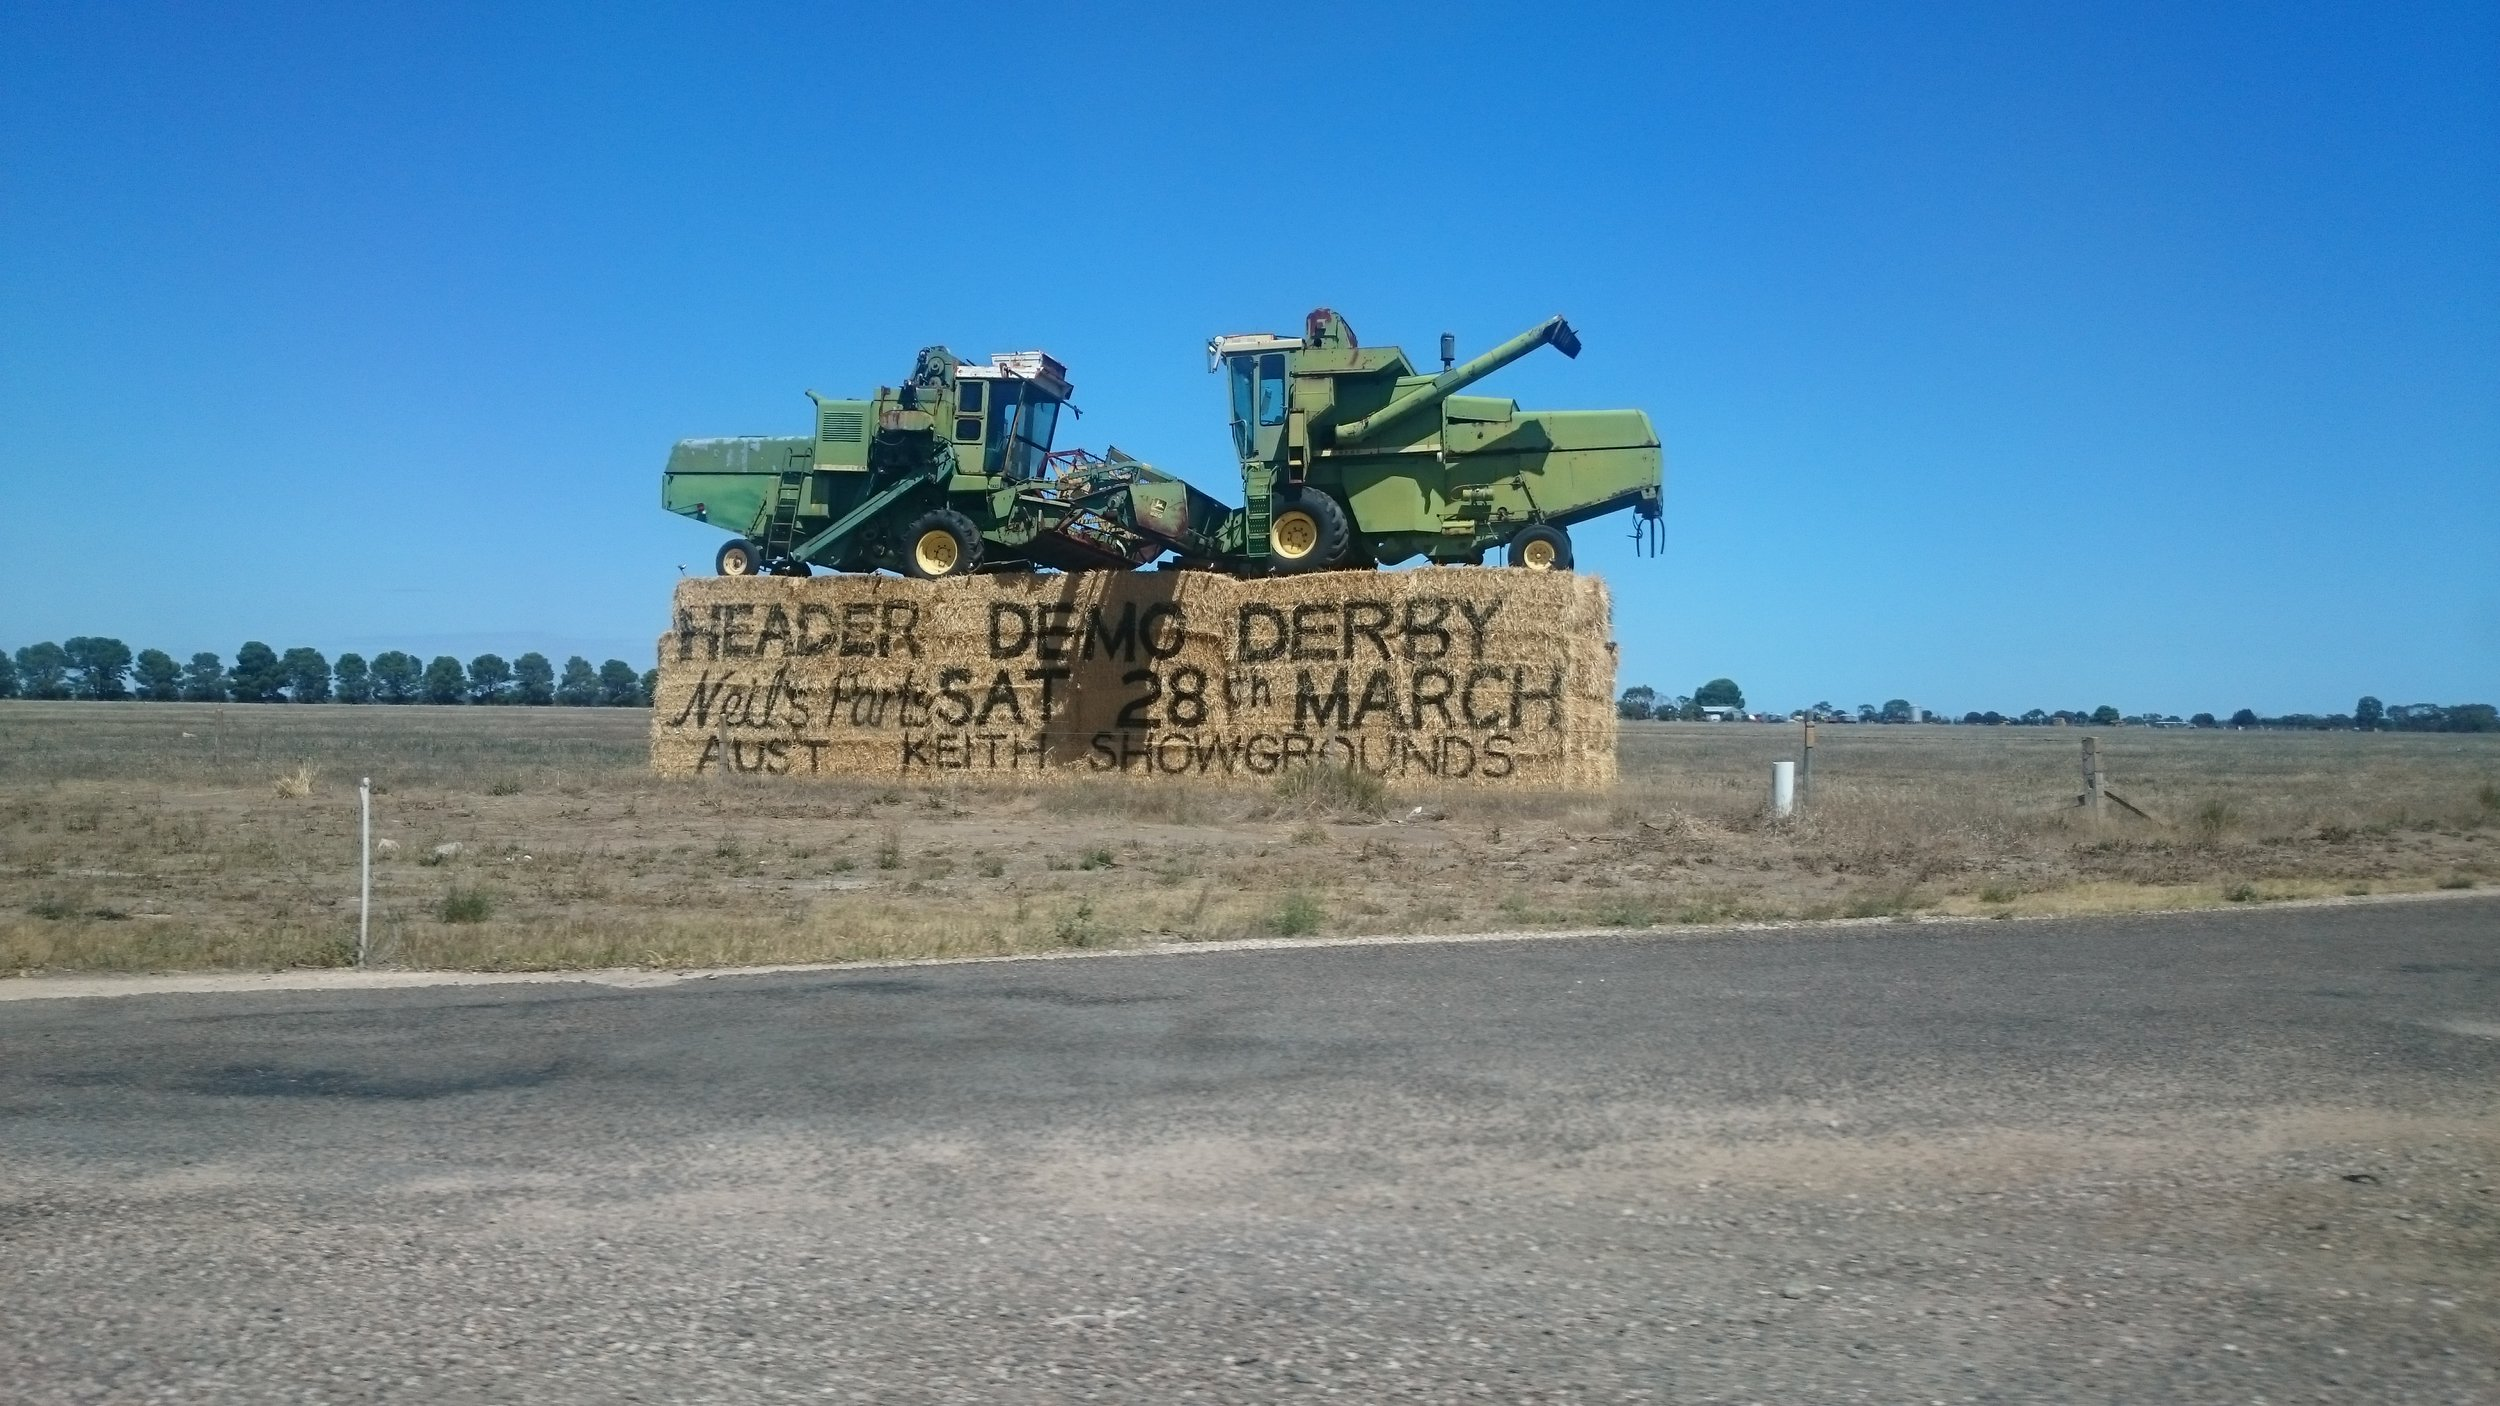 Tractor Demo Derby - Keith, South Australia